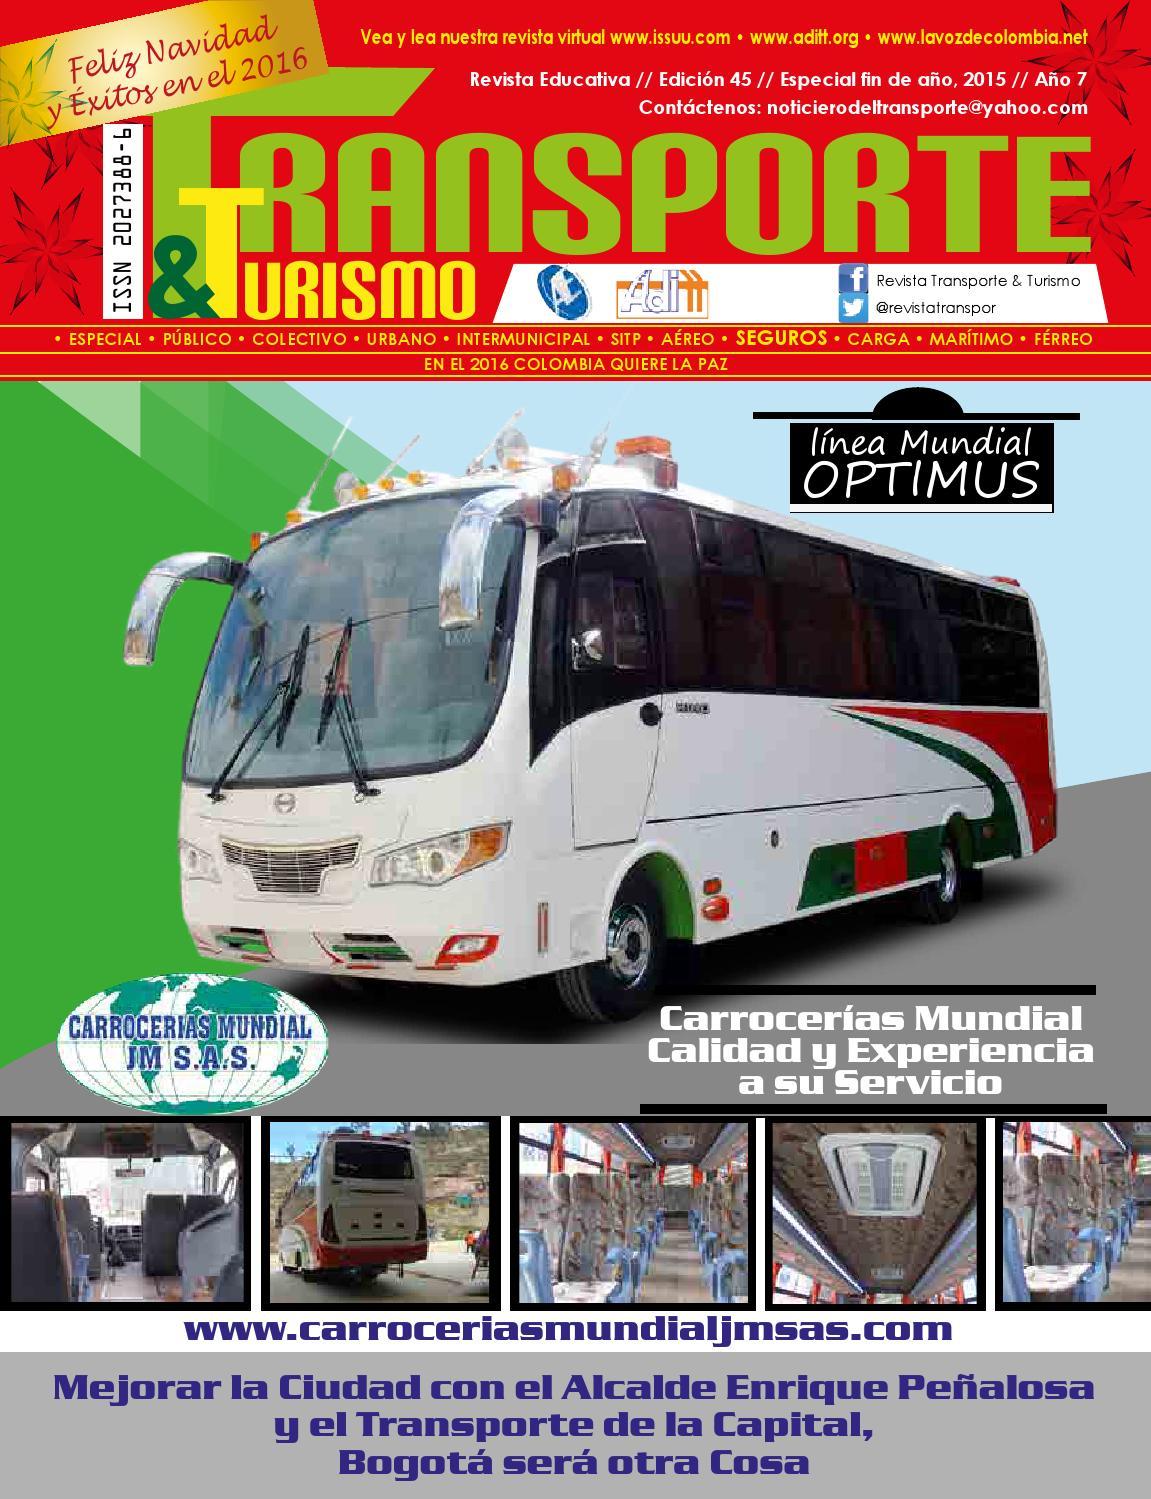 Revista transporte & turismo fin de año web by Revista Transporte ...